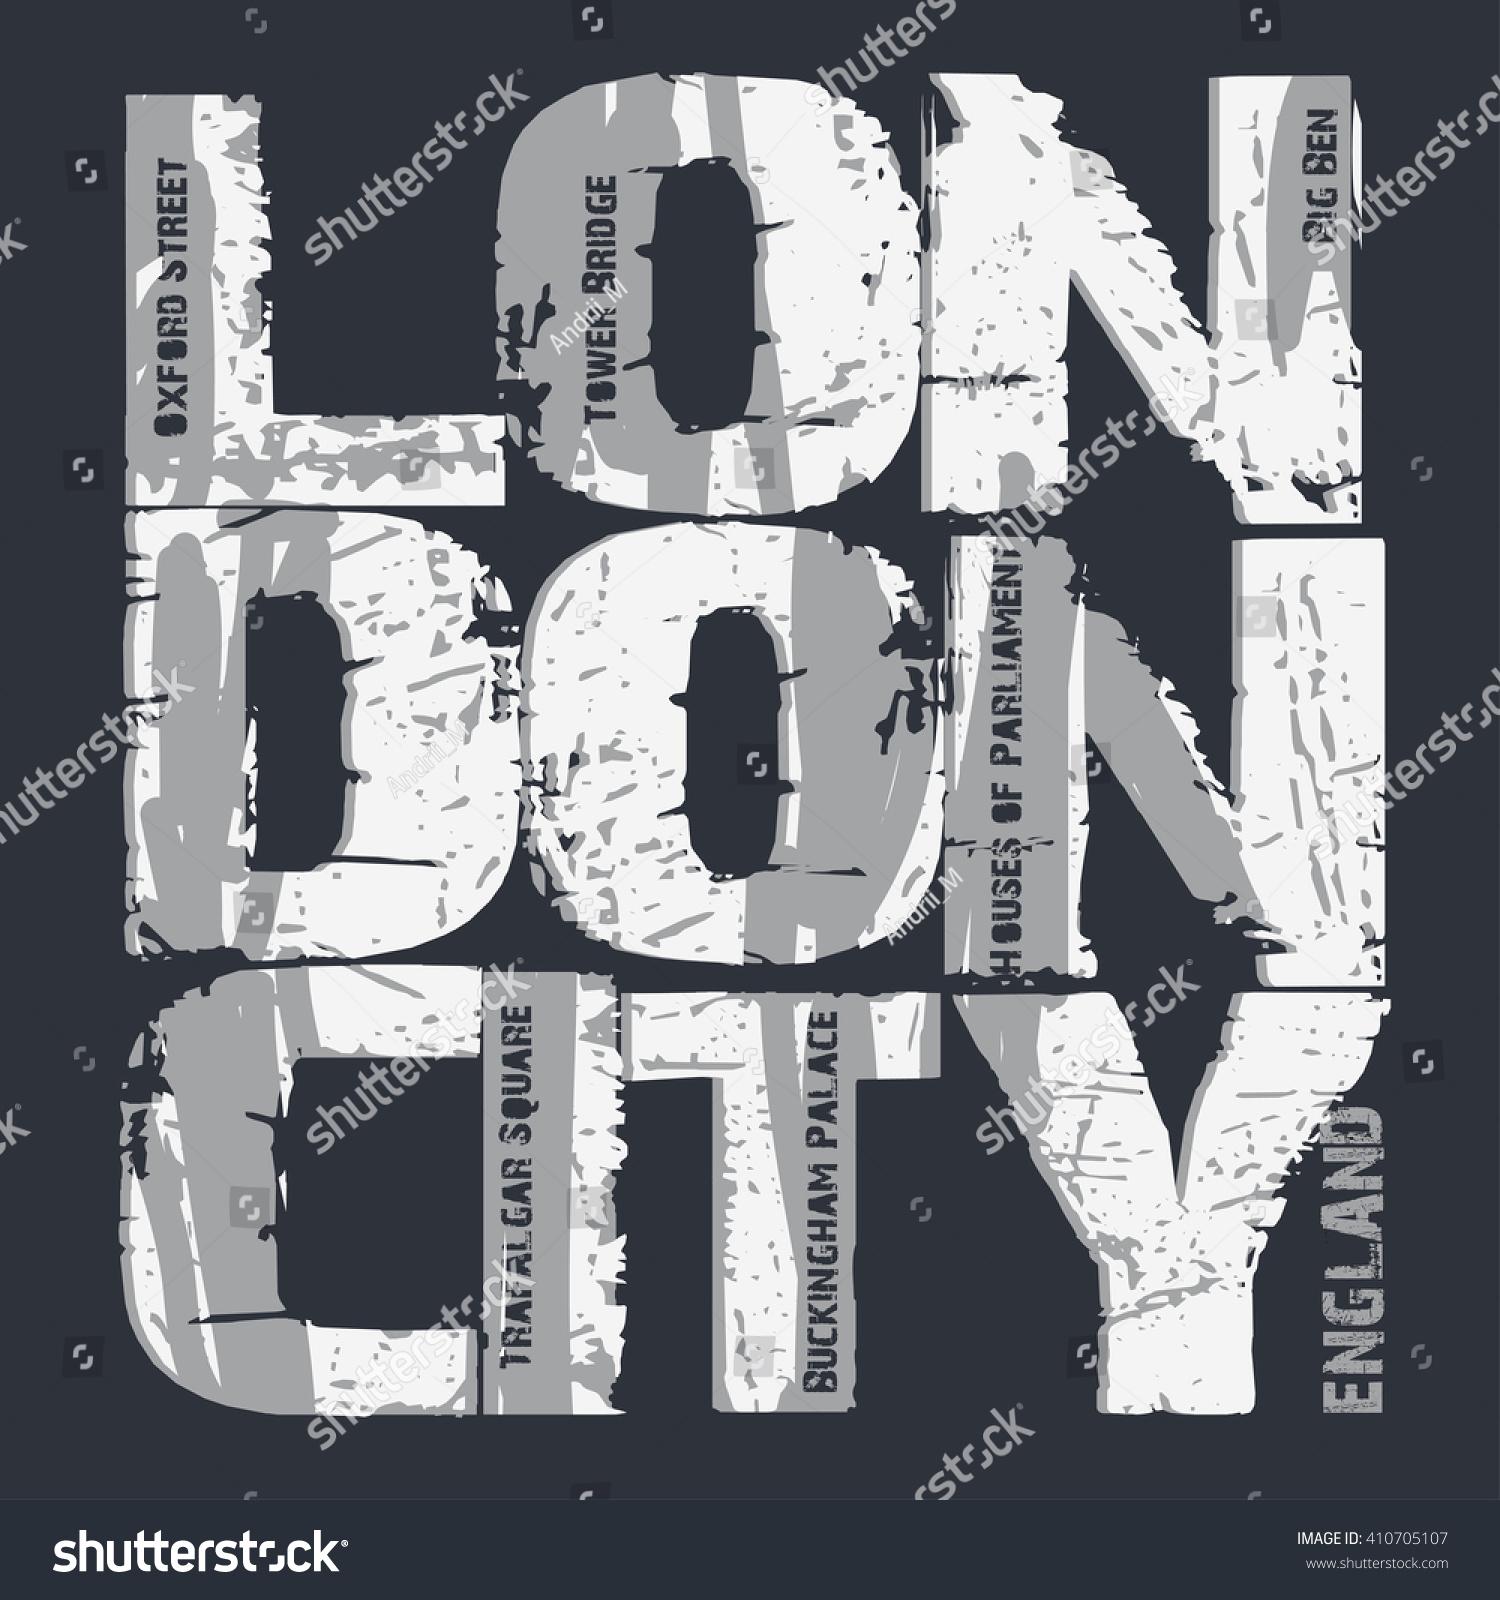 Shirt design london - London T Shirt Grunge Design London City Typography Graphics London Jersey Print